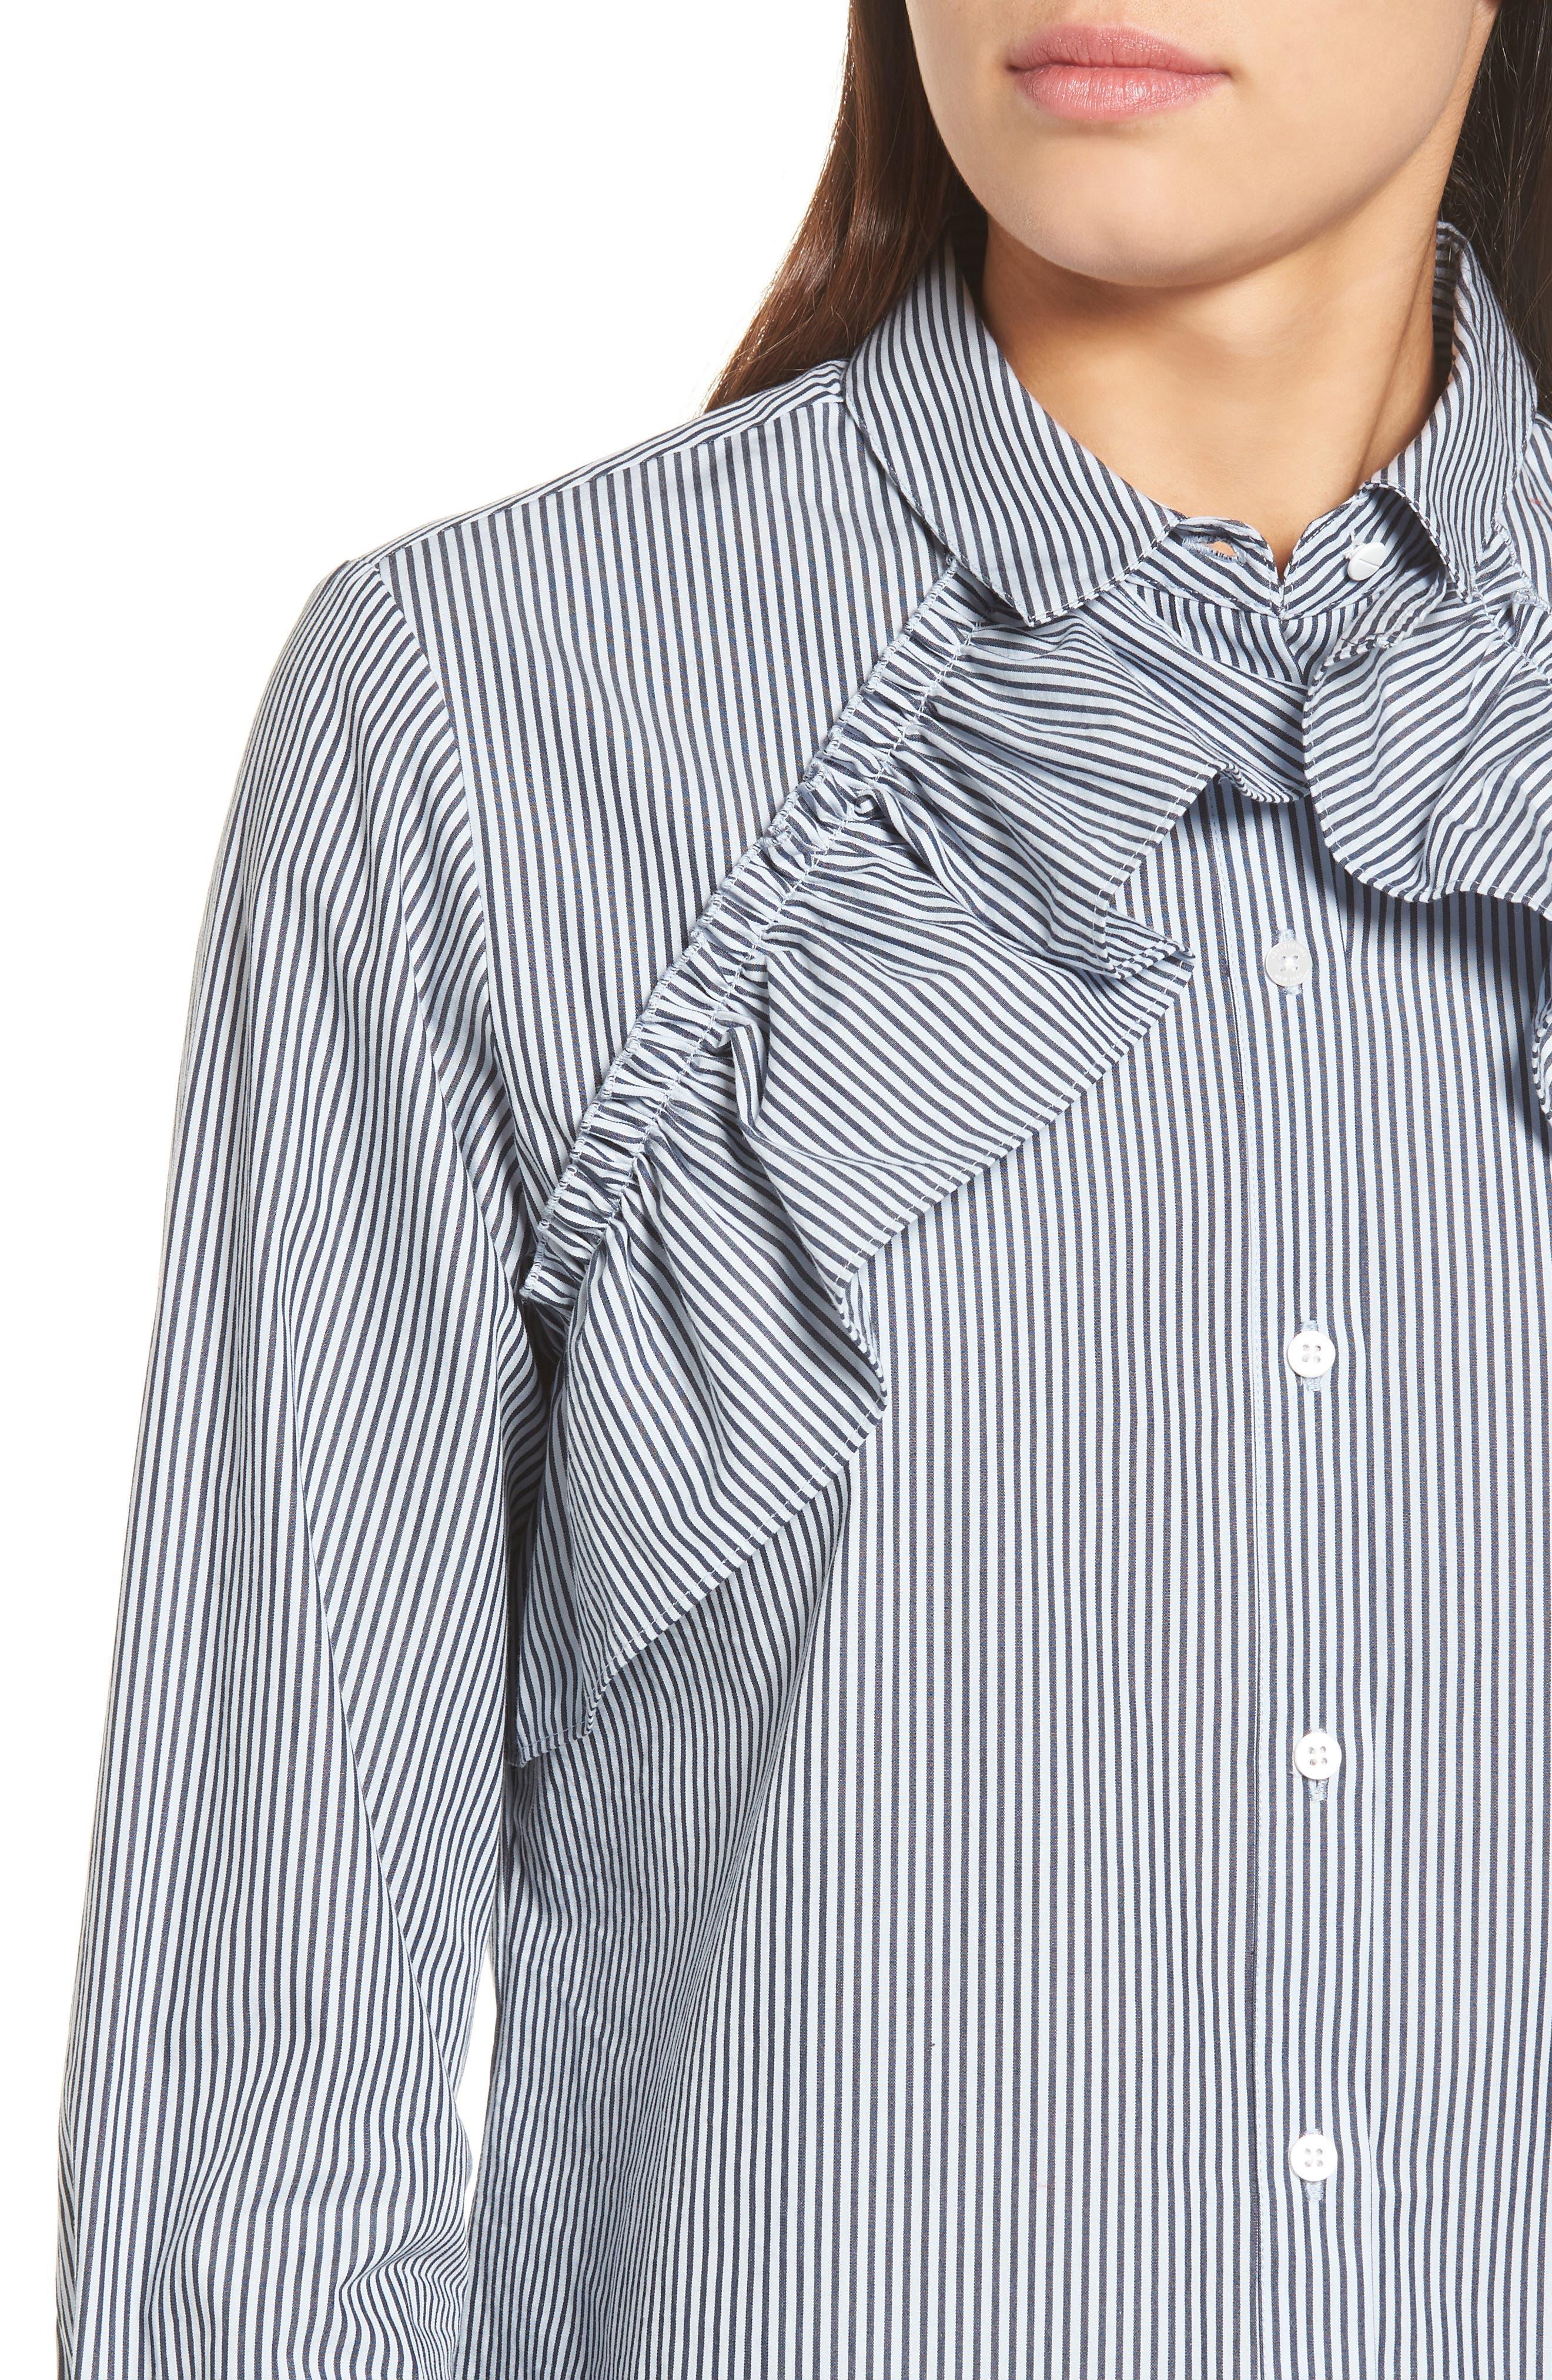 Ruffle Poplin Shirt,                             Alternate thumbnail 4, color,                             460